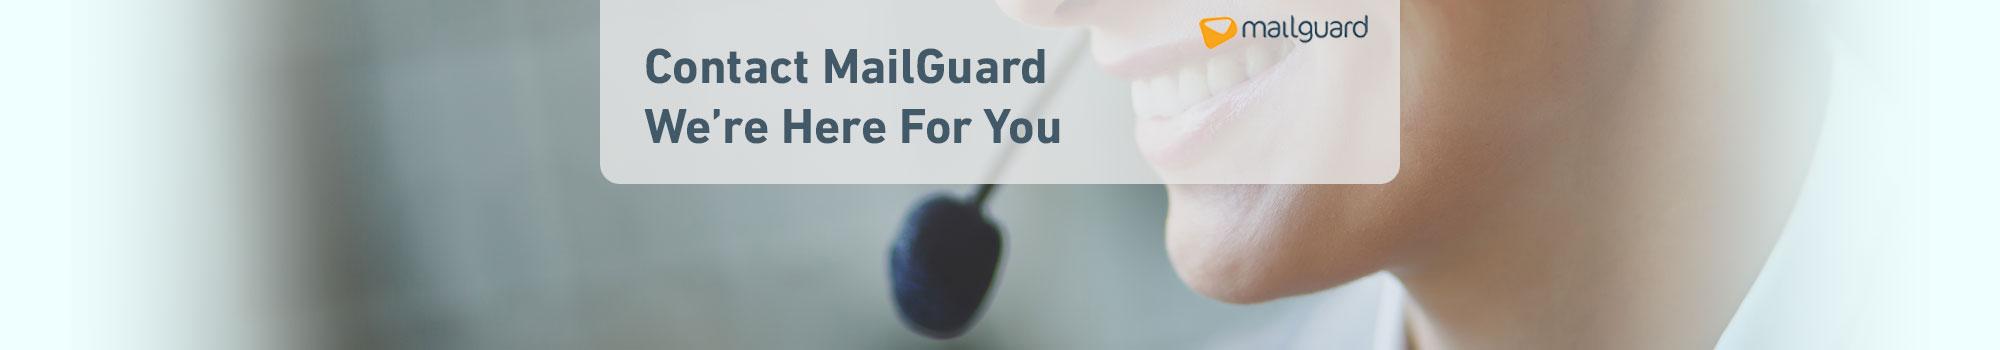 Contact MailGuard